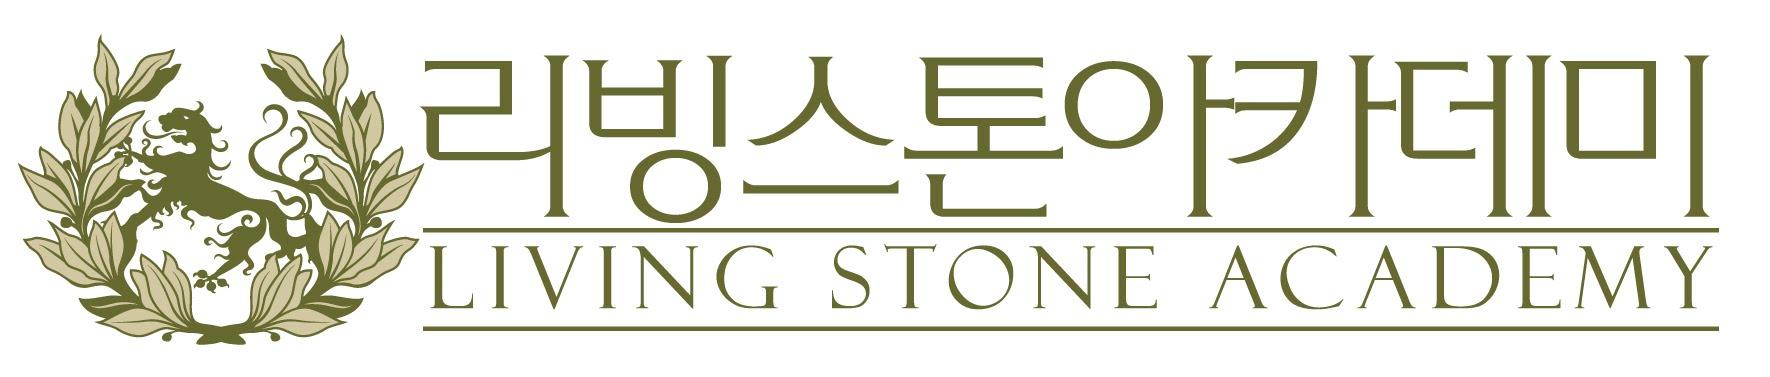 http://www.cinfoshare.org/education/living-stone-academy